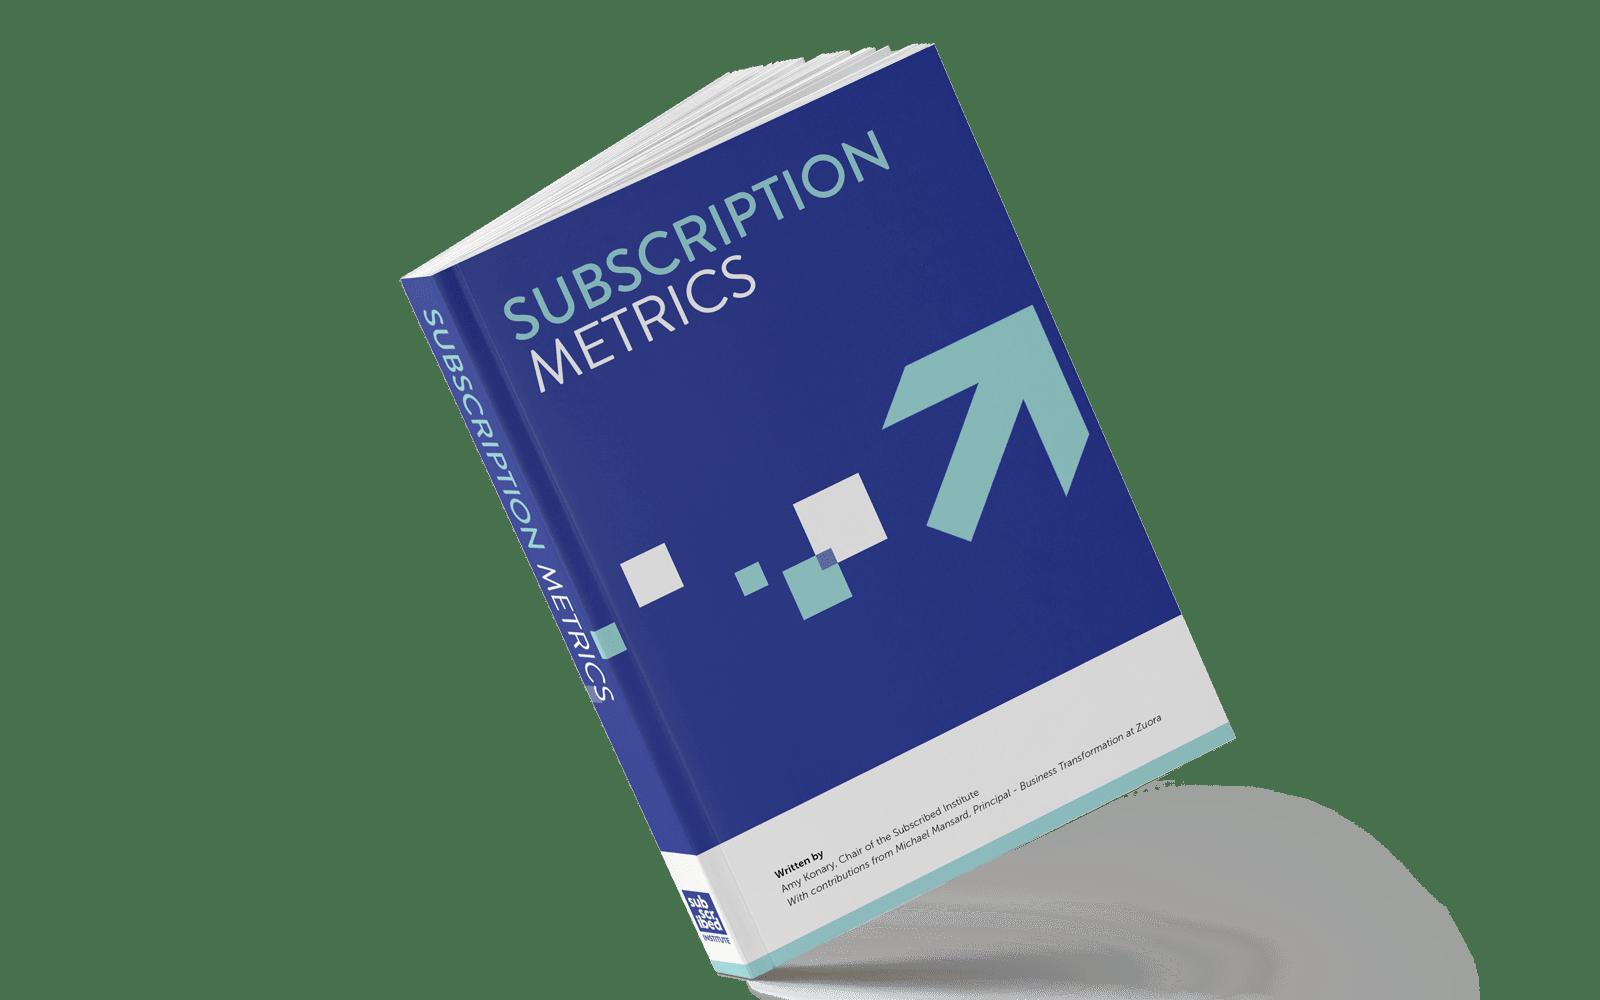 Subscription-Metrics-Book-Mock.png